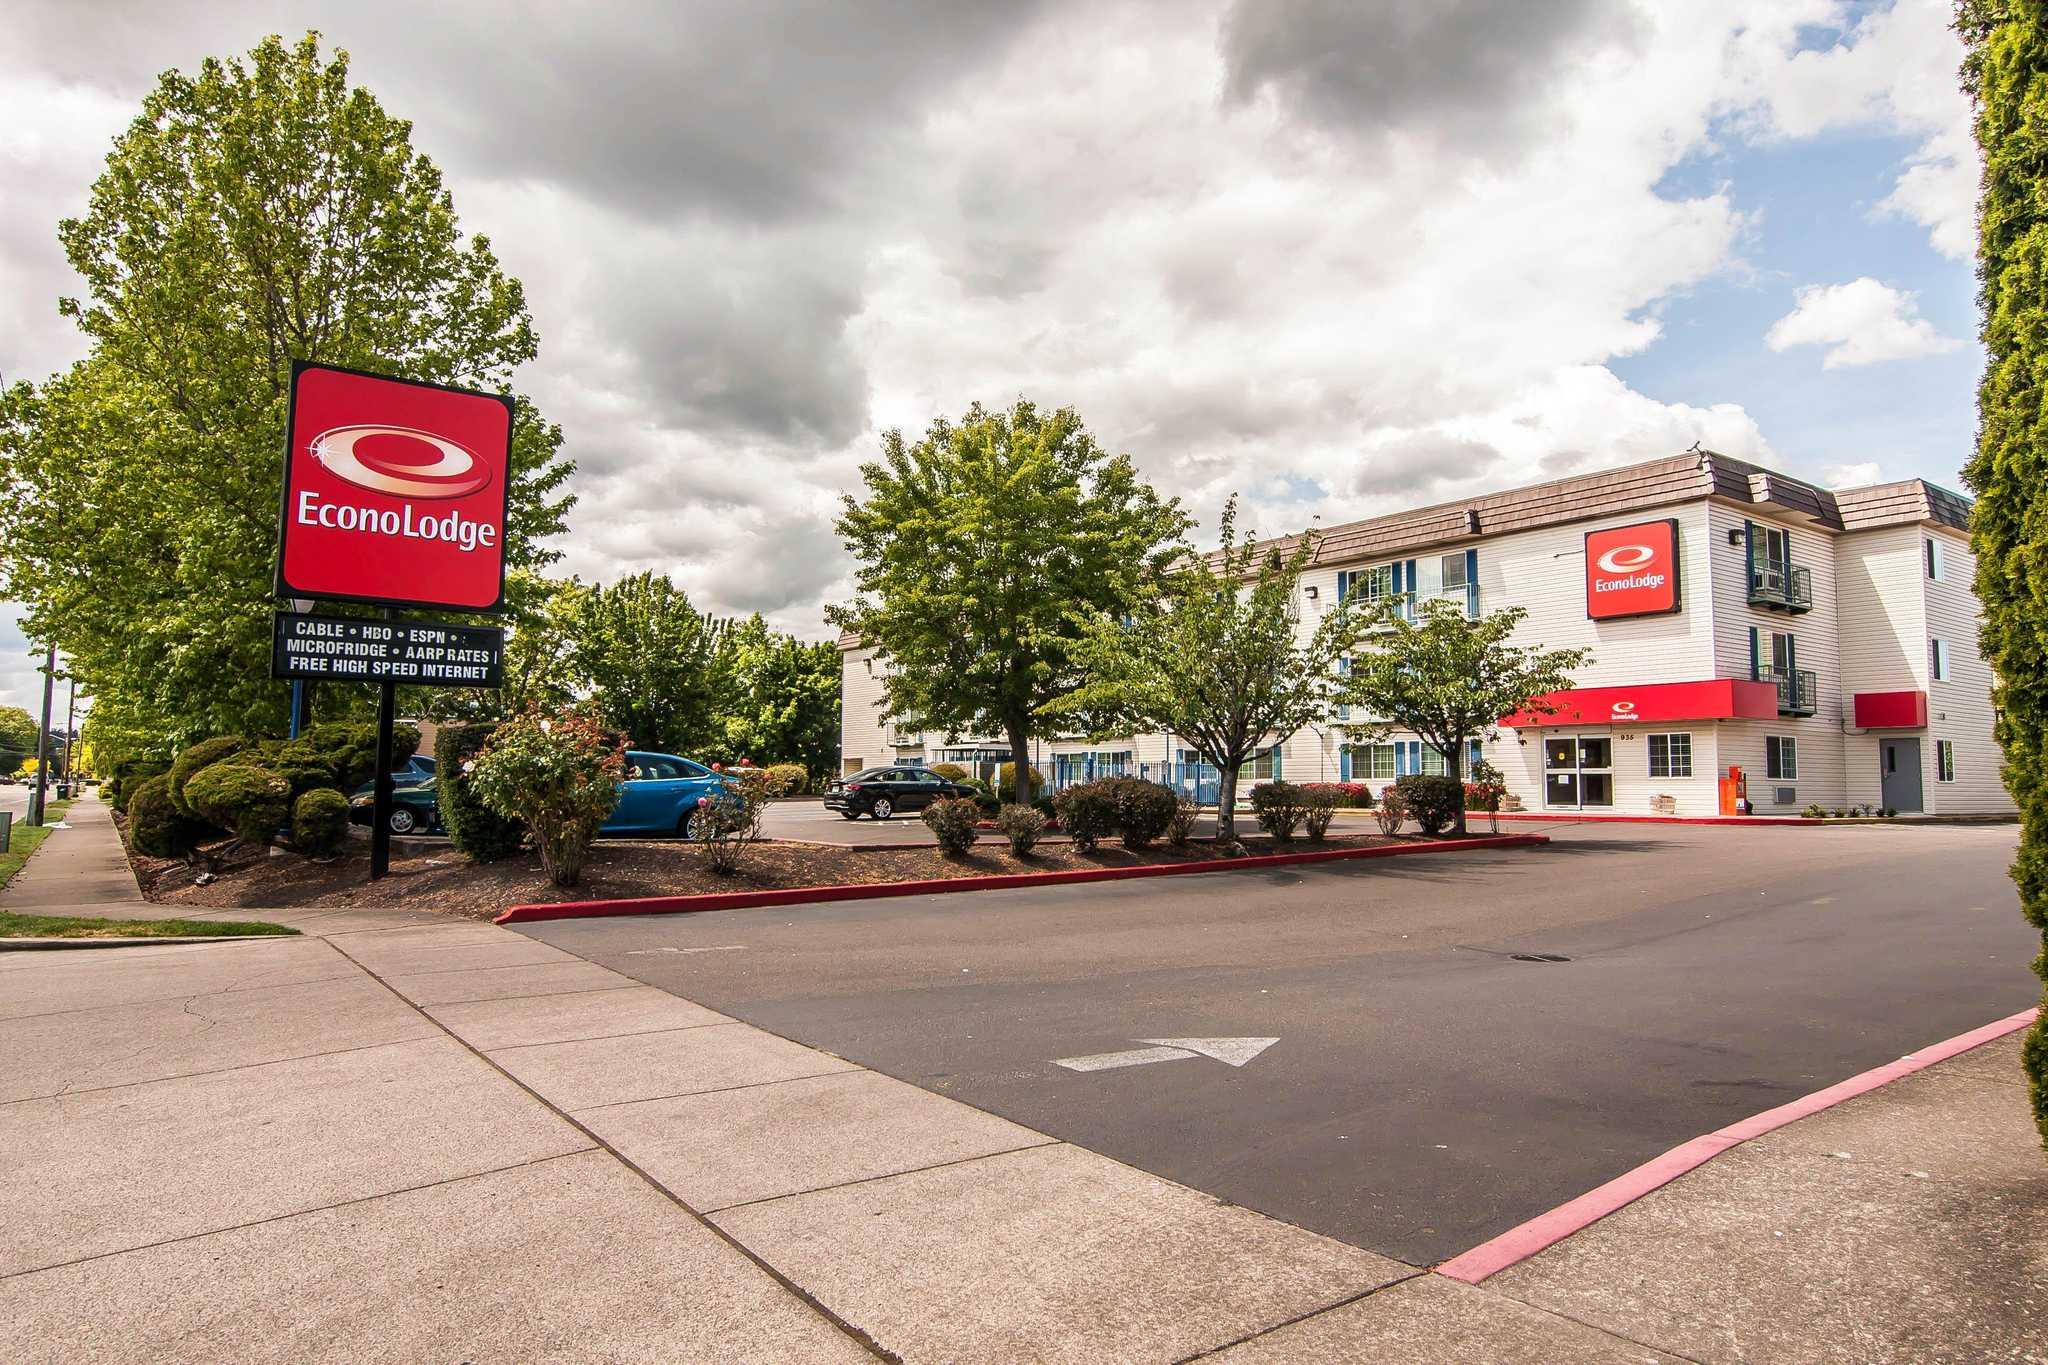 Econo Lodge Corvallis Oregon Or Localdatabase Com